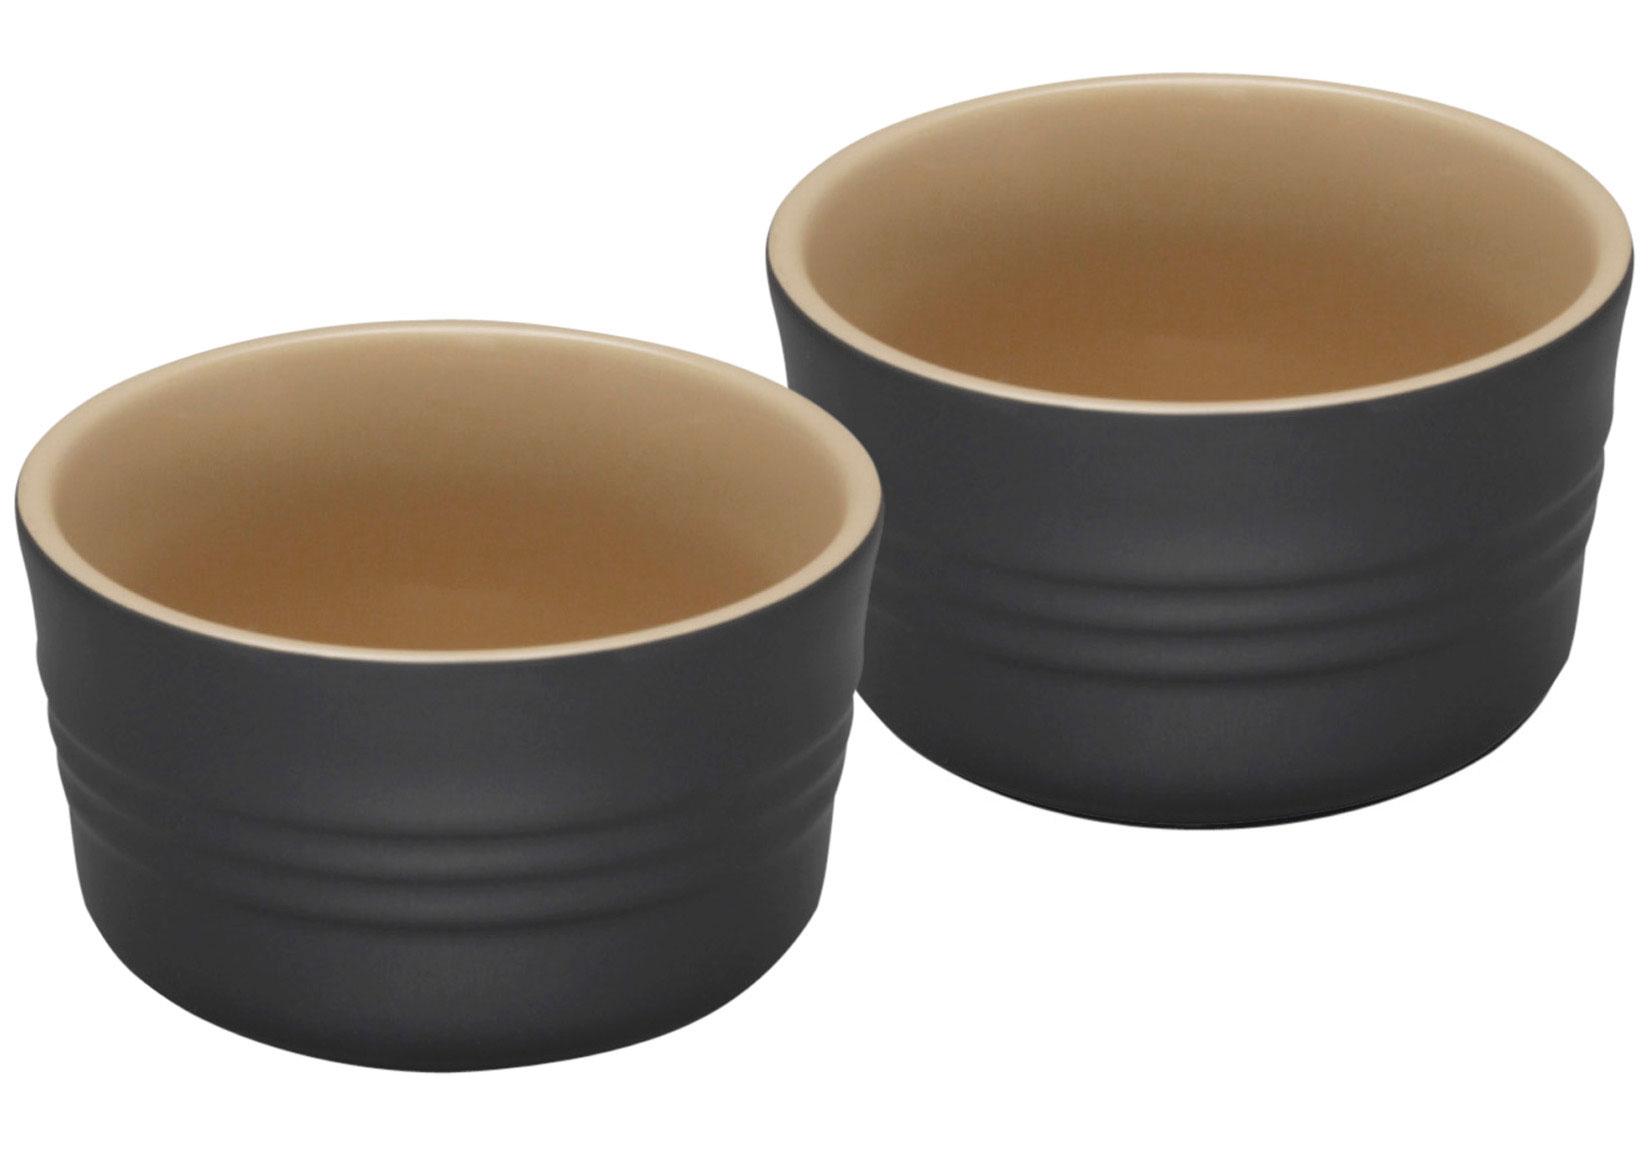 Le Creuset Ramekins - Black Stoneware